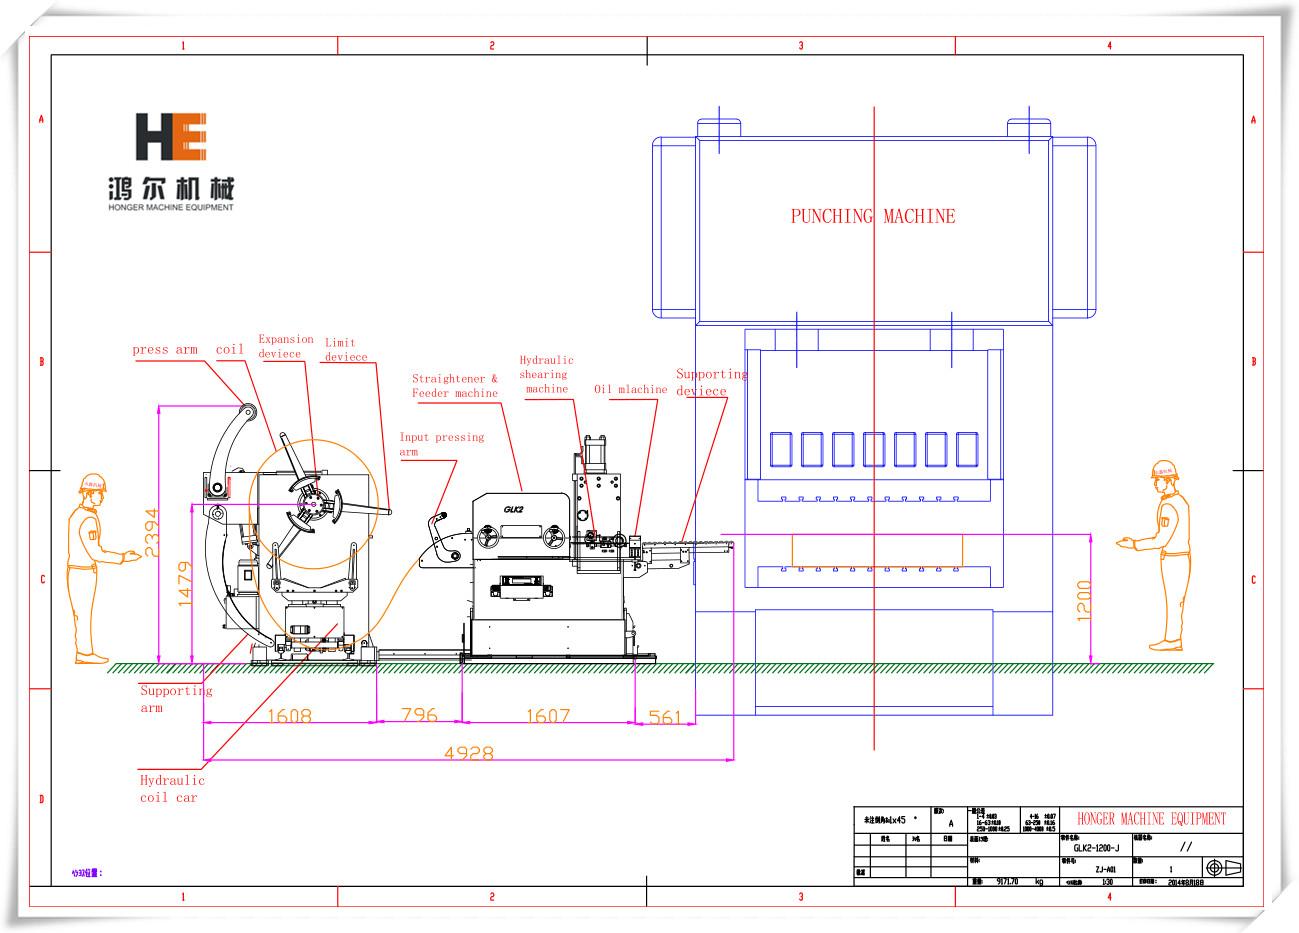 wiper motor servo wiring diagram servo coils diagram 3 in 1 precision nc servo straightener feeder machine ... #12